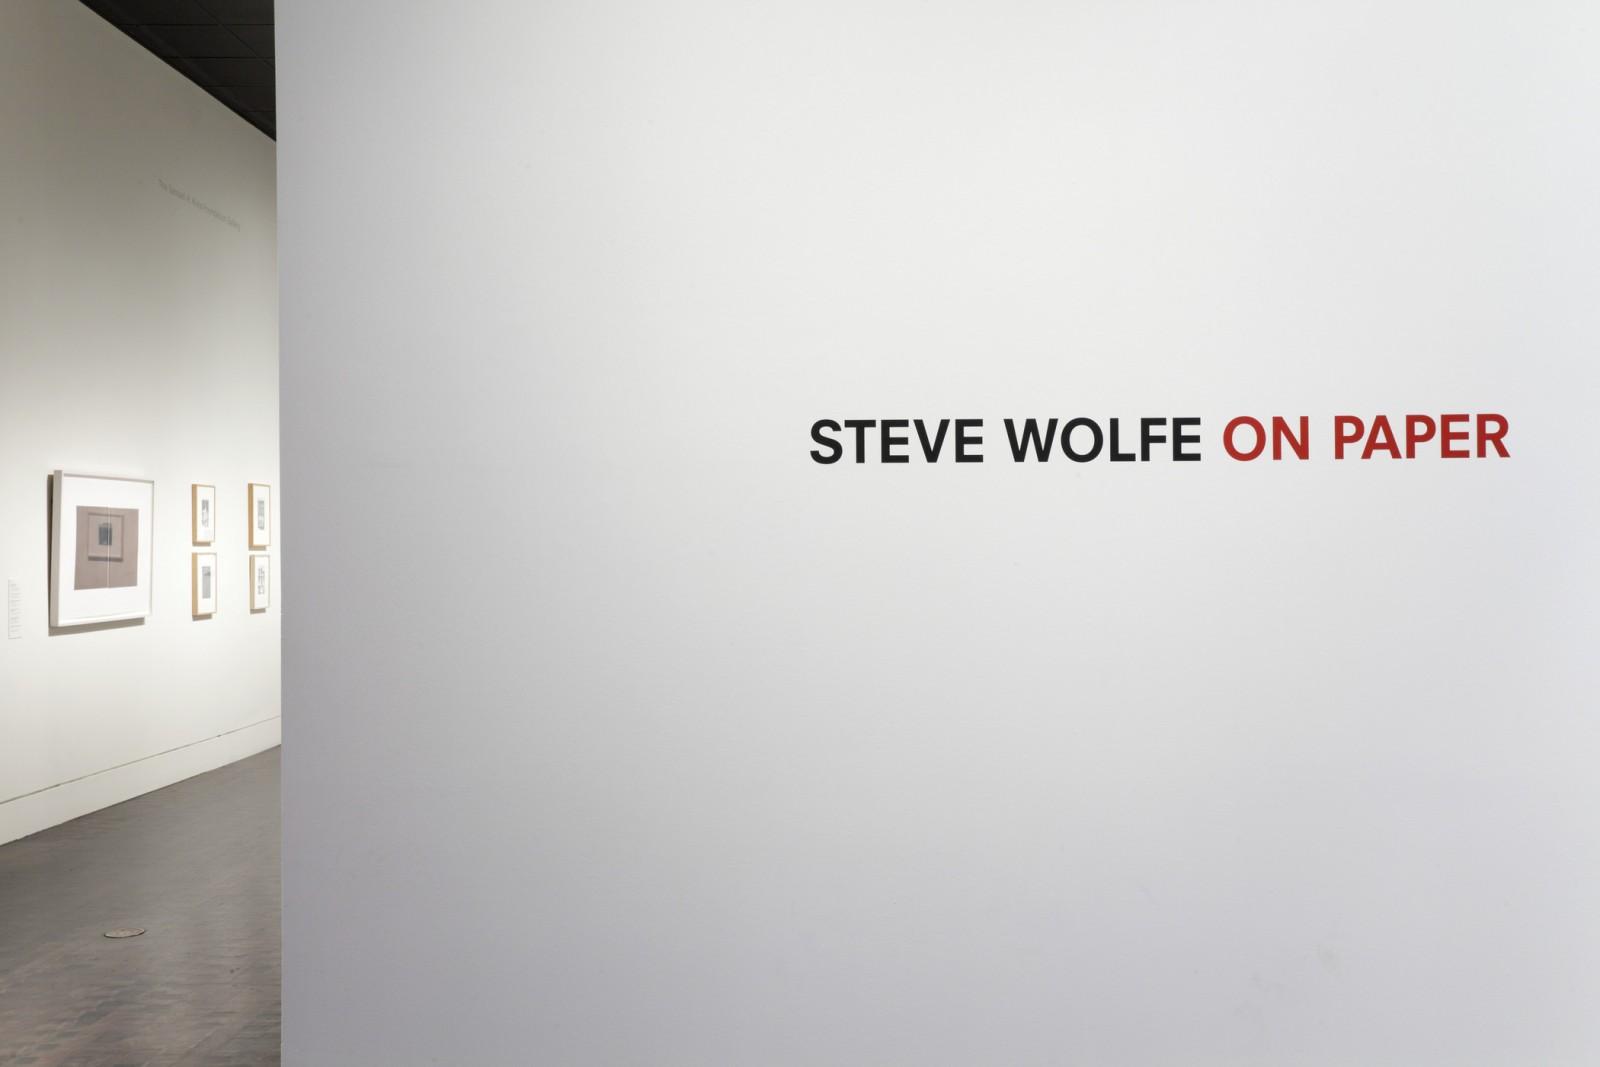 Steve Wolfe on Paper | LACMA